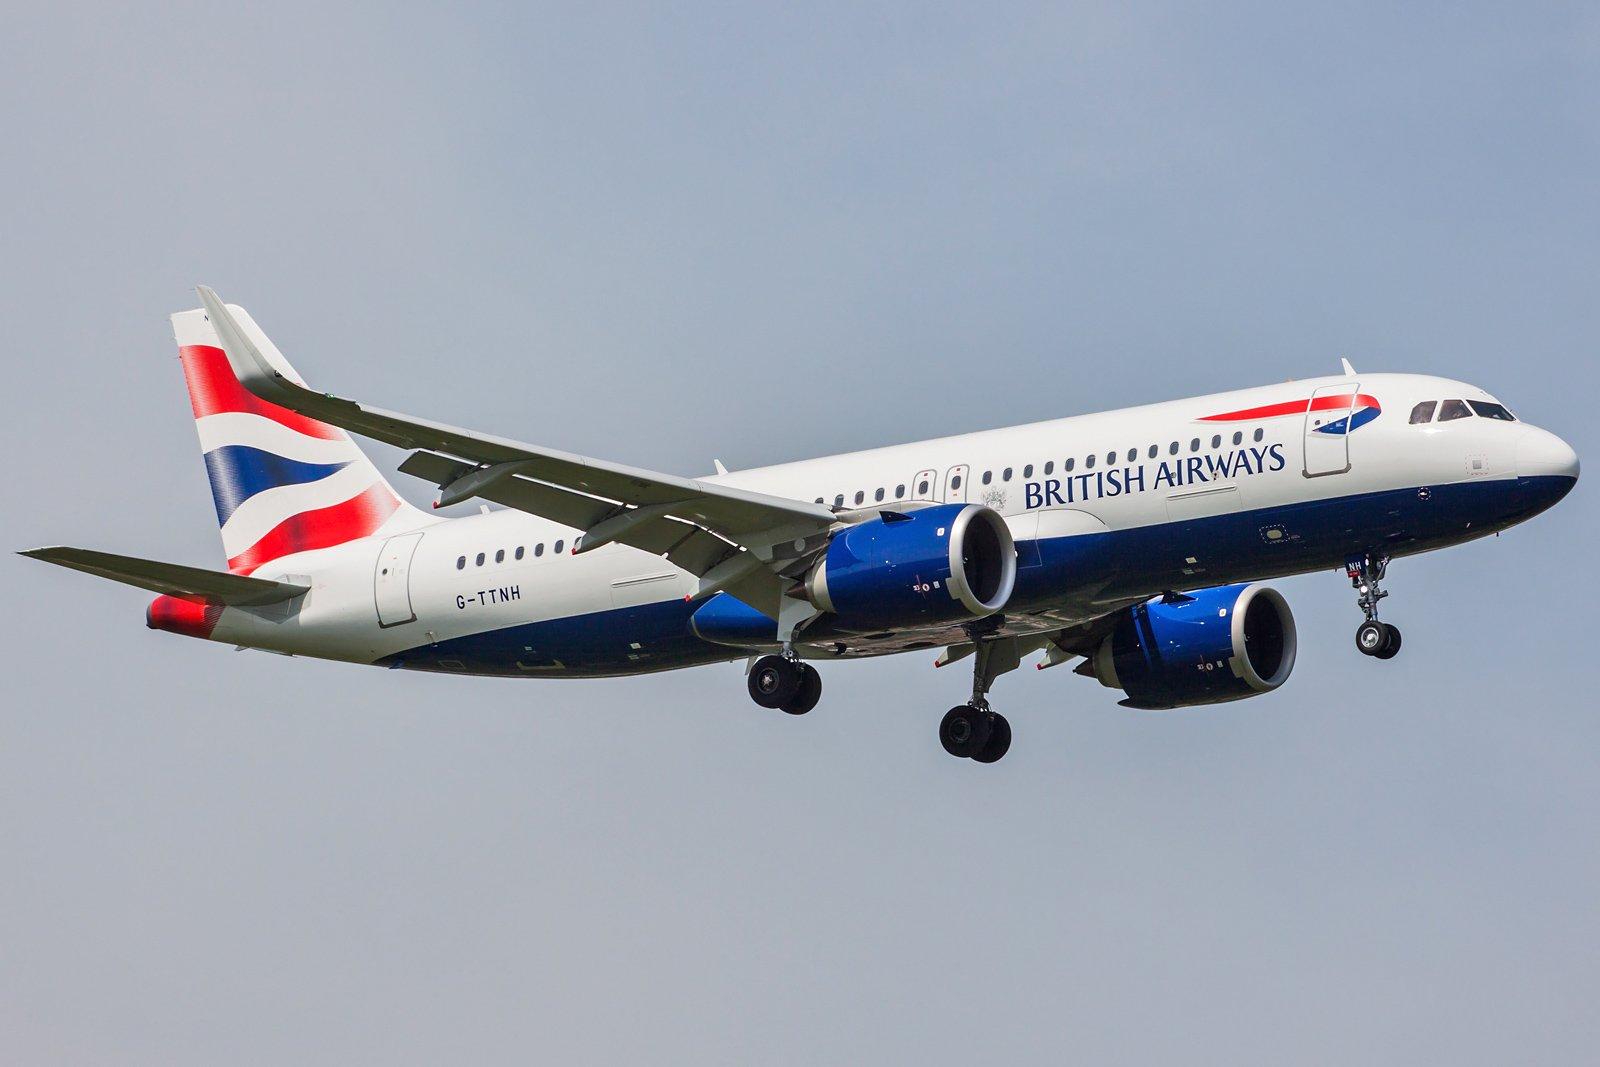 British Airways Airbus A320-251N G-TTNH